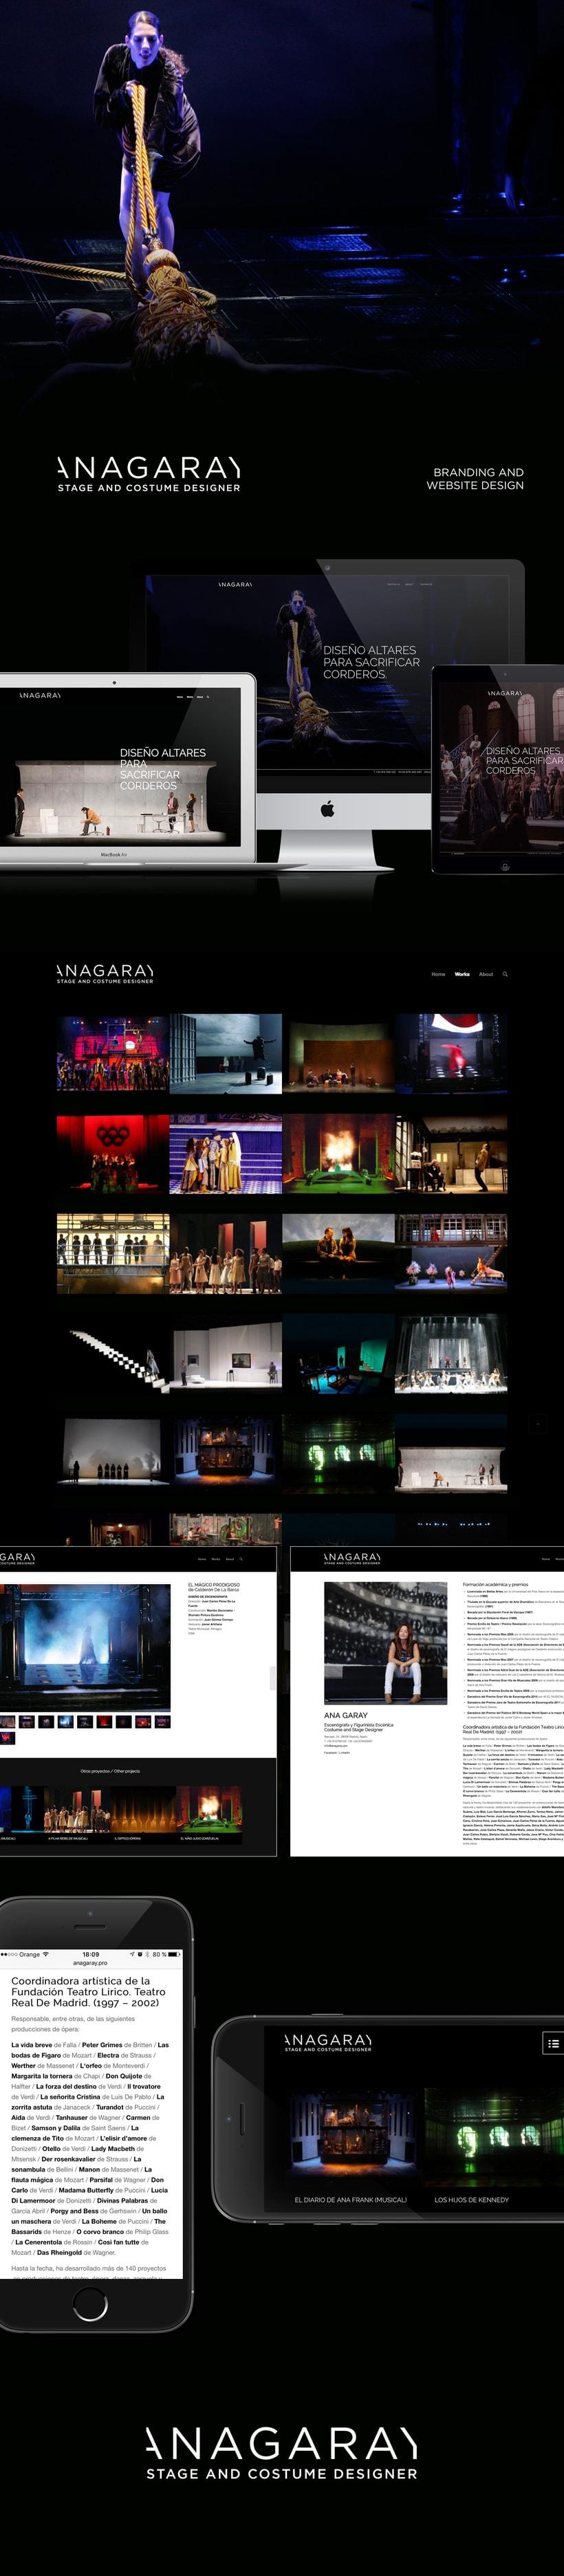 Ana Garay: Website & Branding Design -1